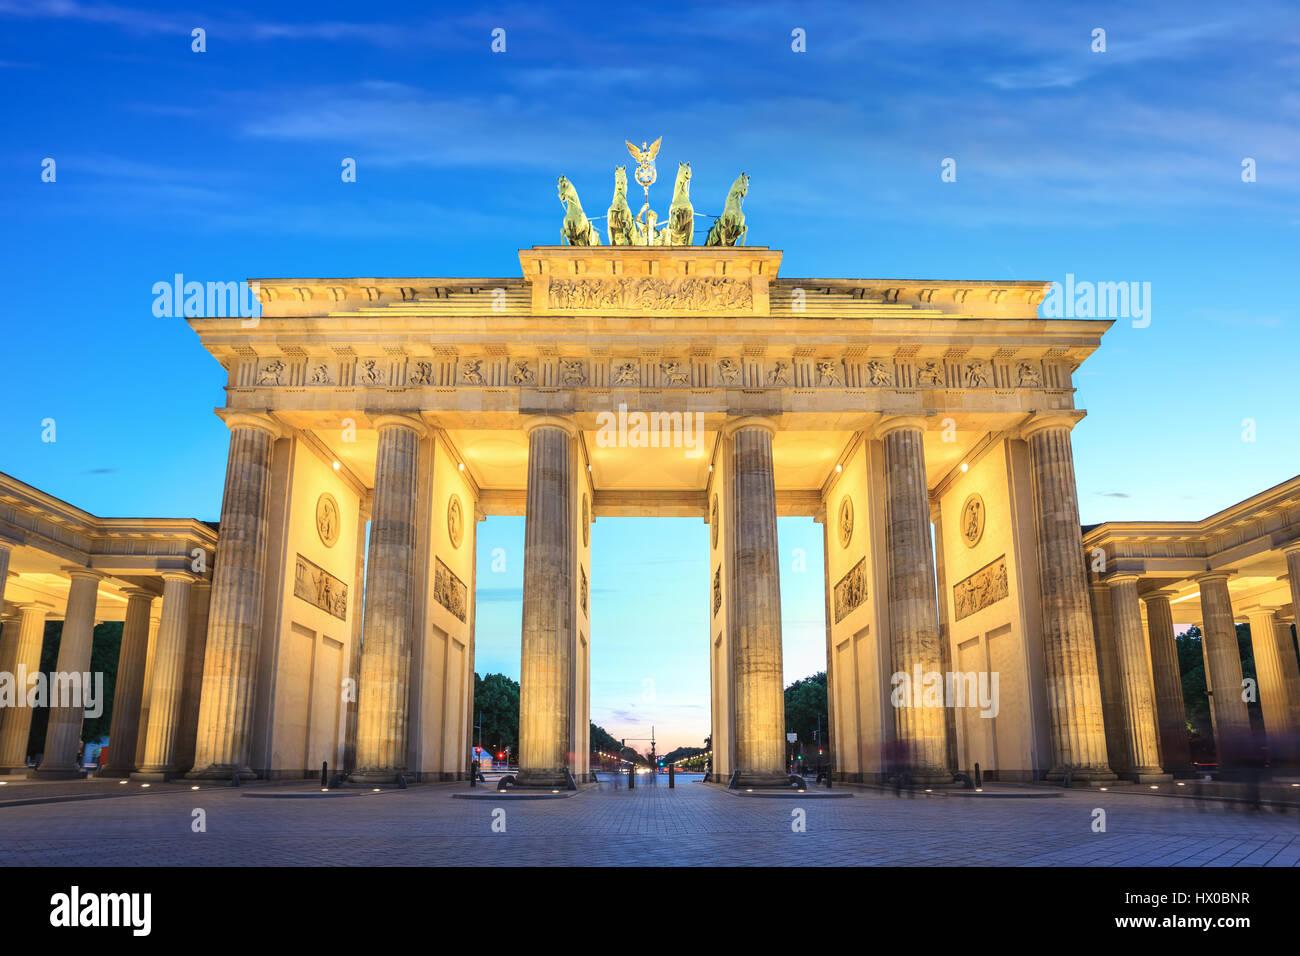 Brandenburger Tor bei Nacht, Berlin, Deutschland Stockbild